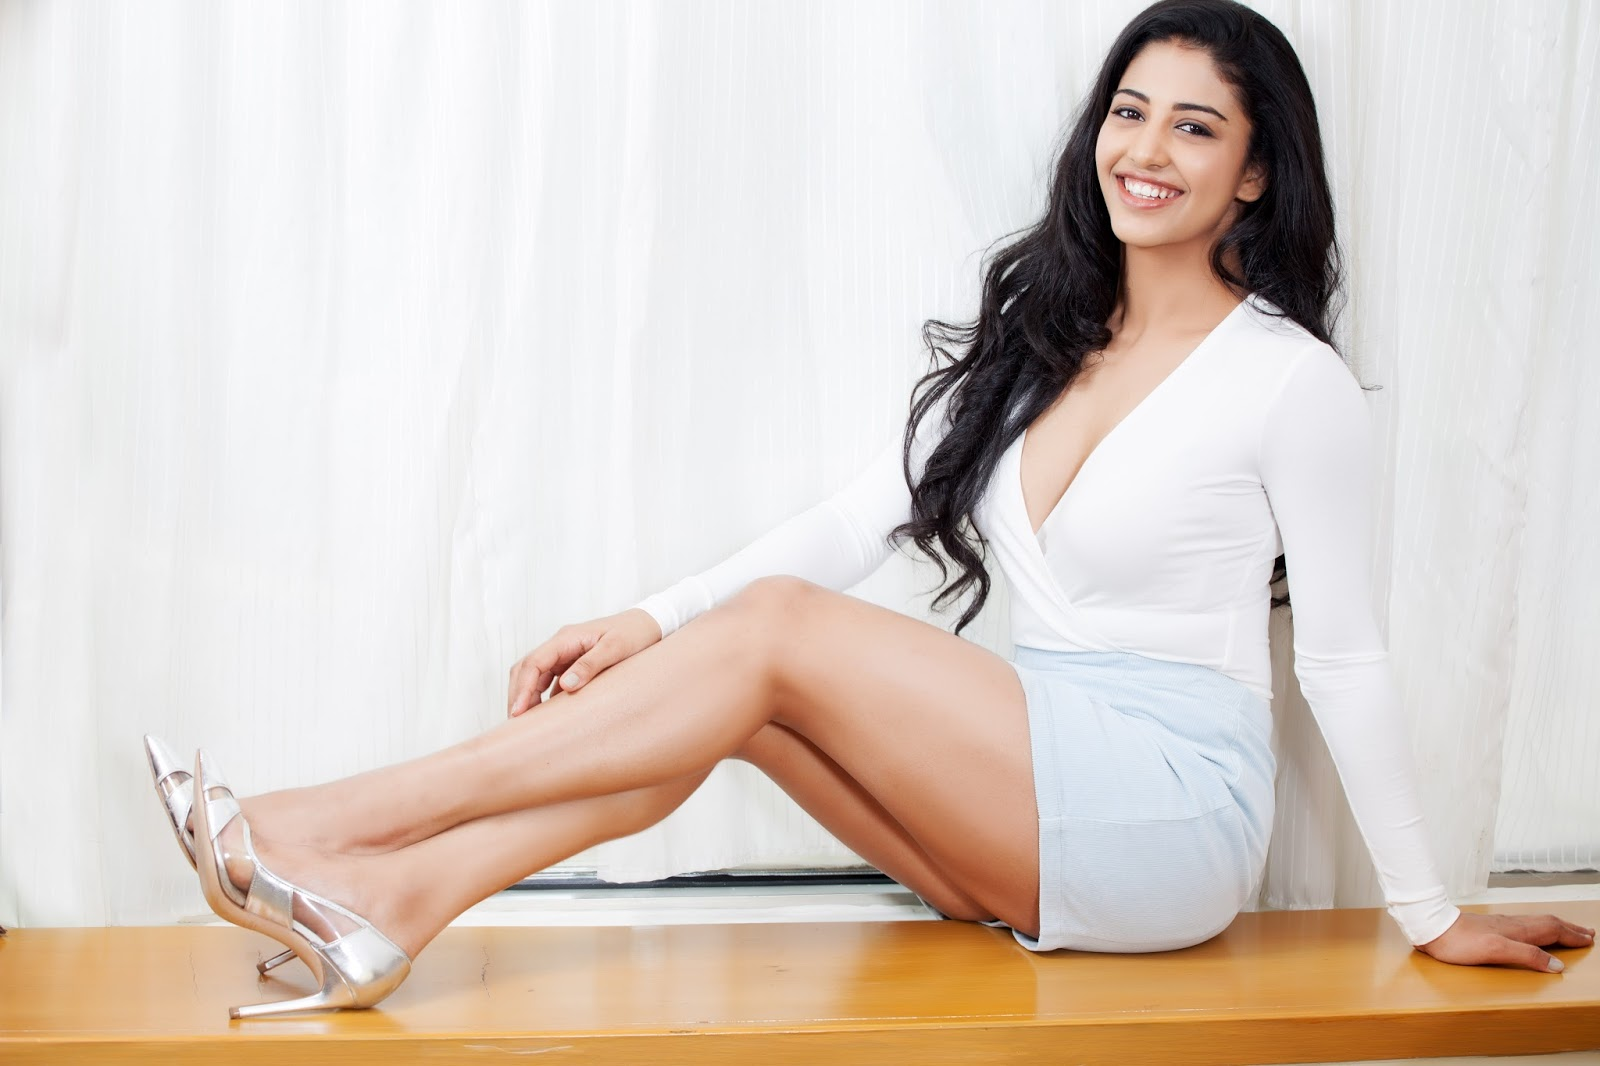 Telugu Actress Daksha Nagarkar in White Dress Hot Photos